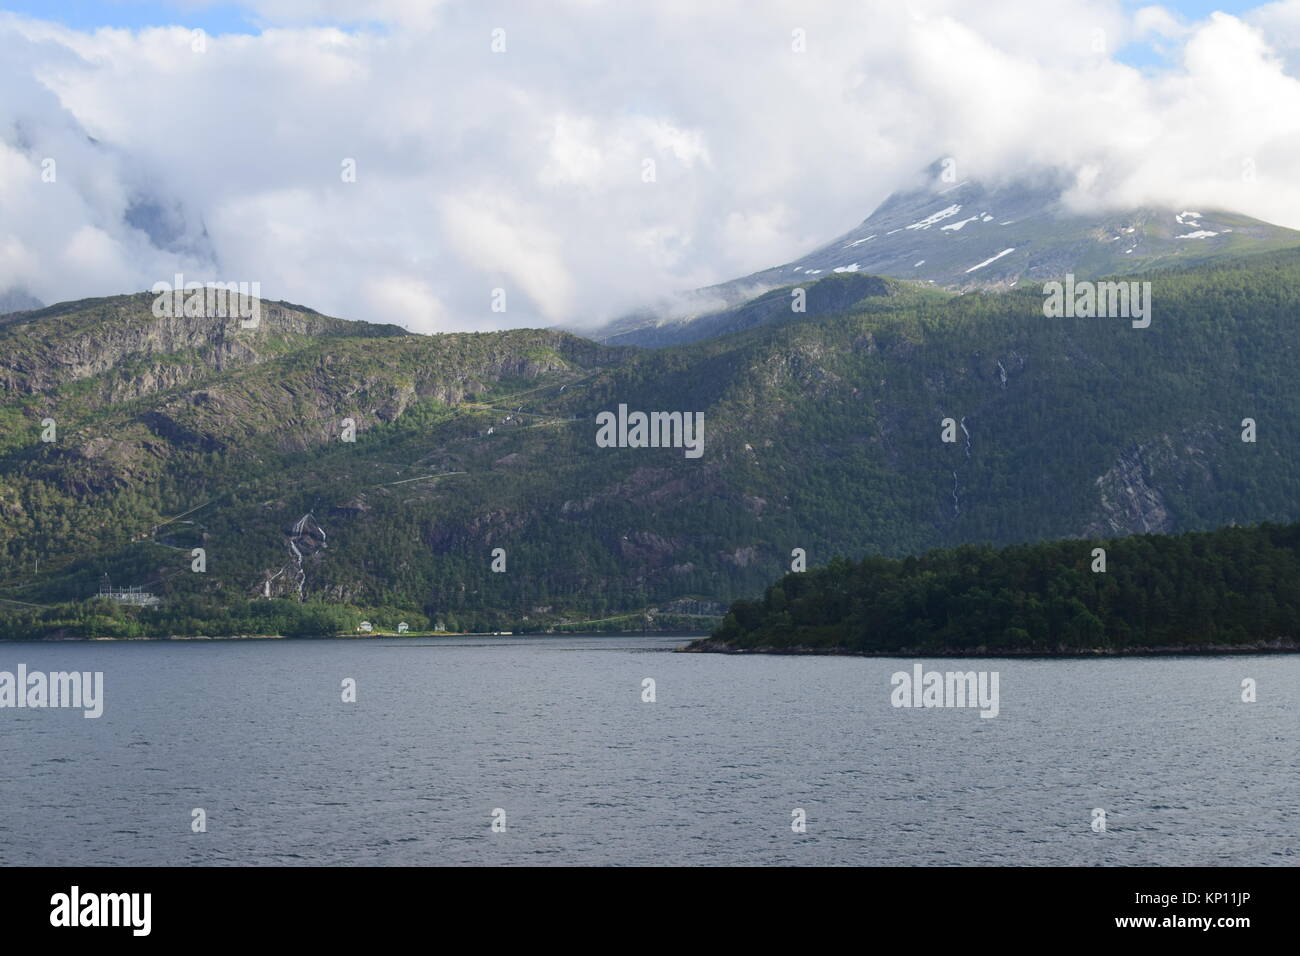 Cruising round Nordfjord, Sogn og Fjordane, Norway 2017 - Stock Image